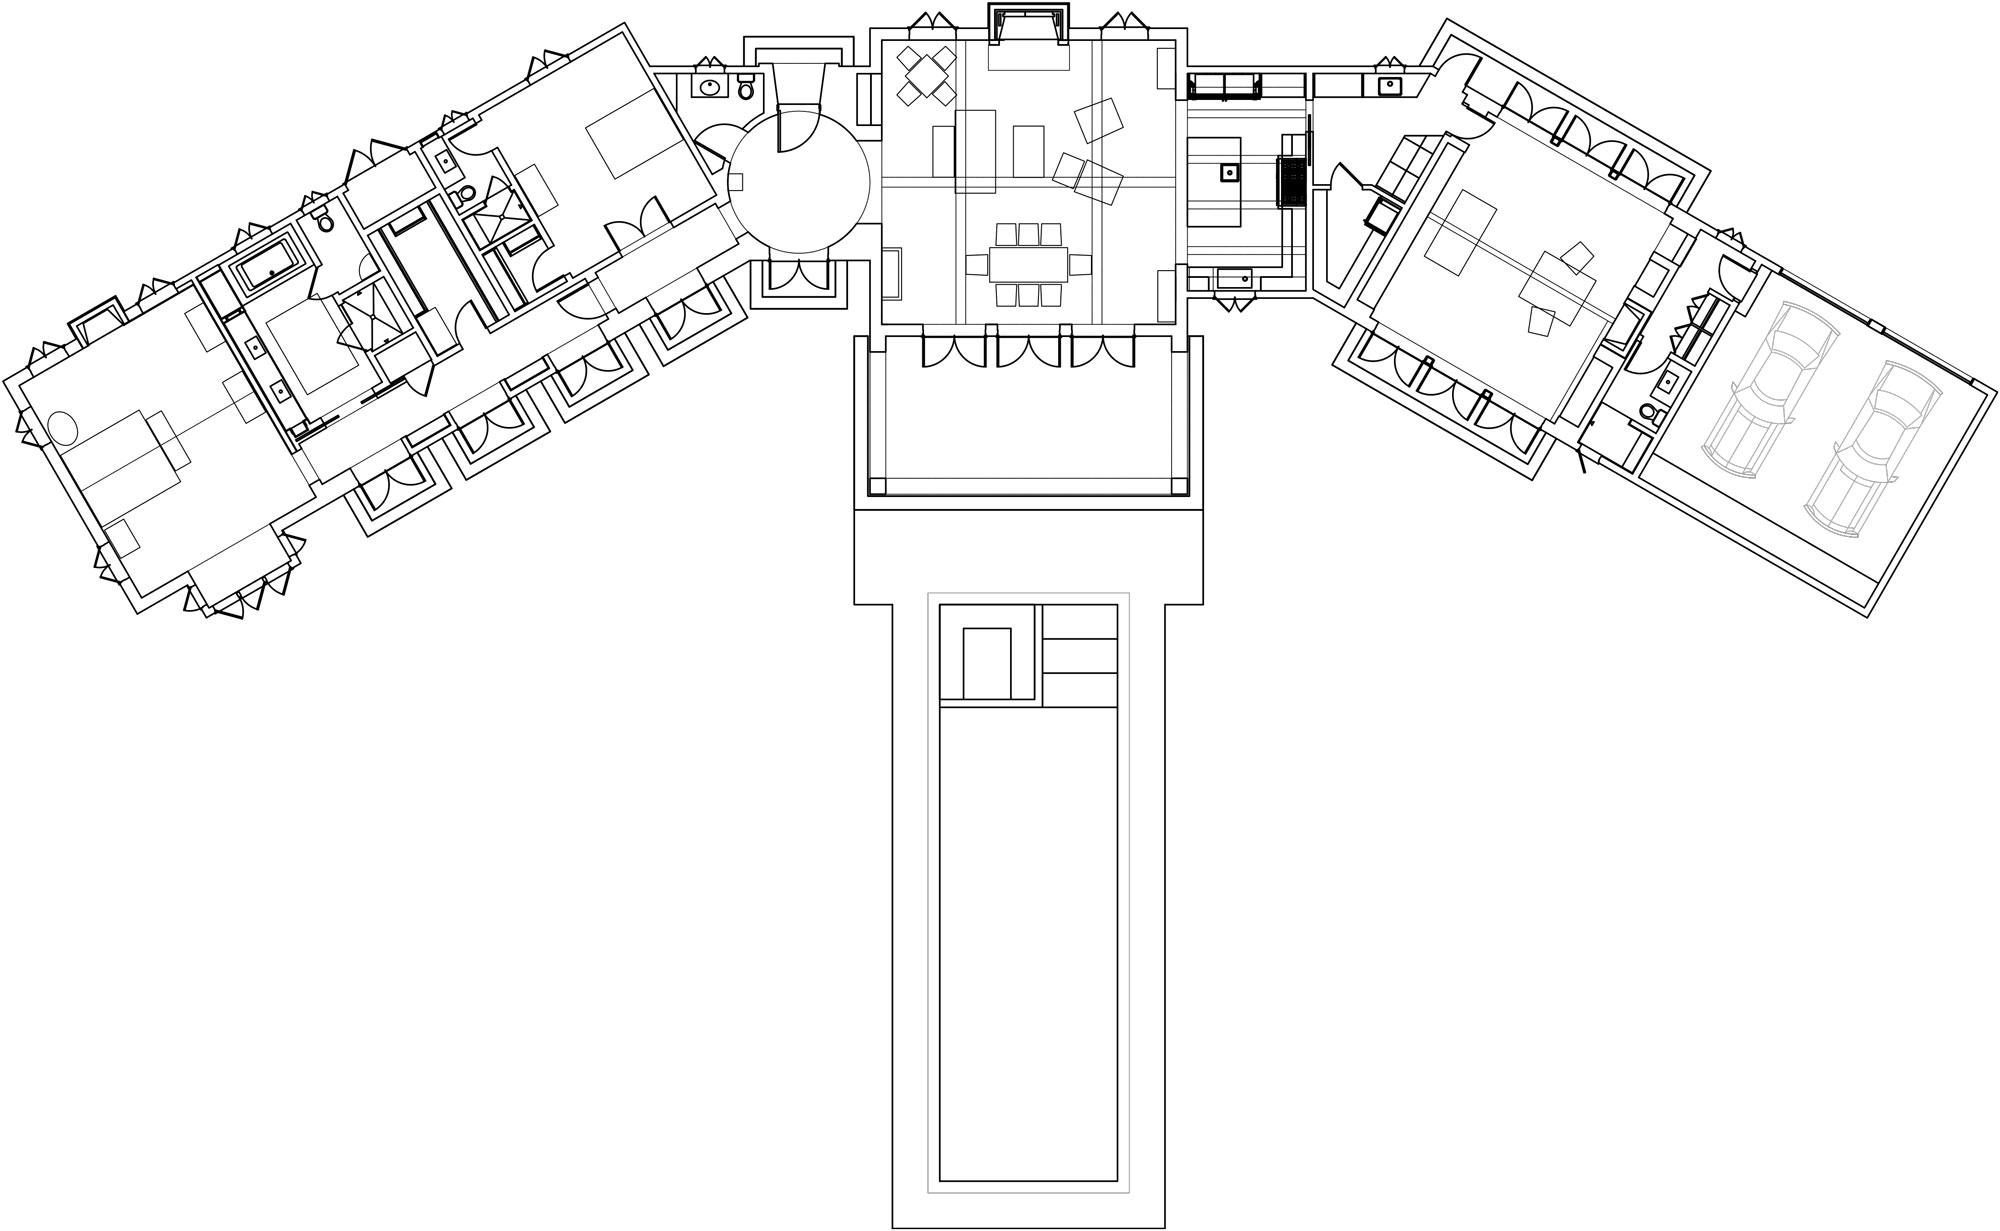 07-JEWELL-SB-FLOOR-PLAN.jpg